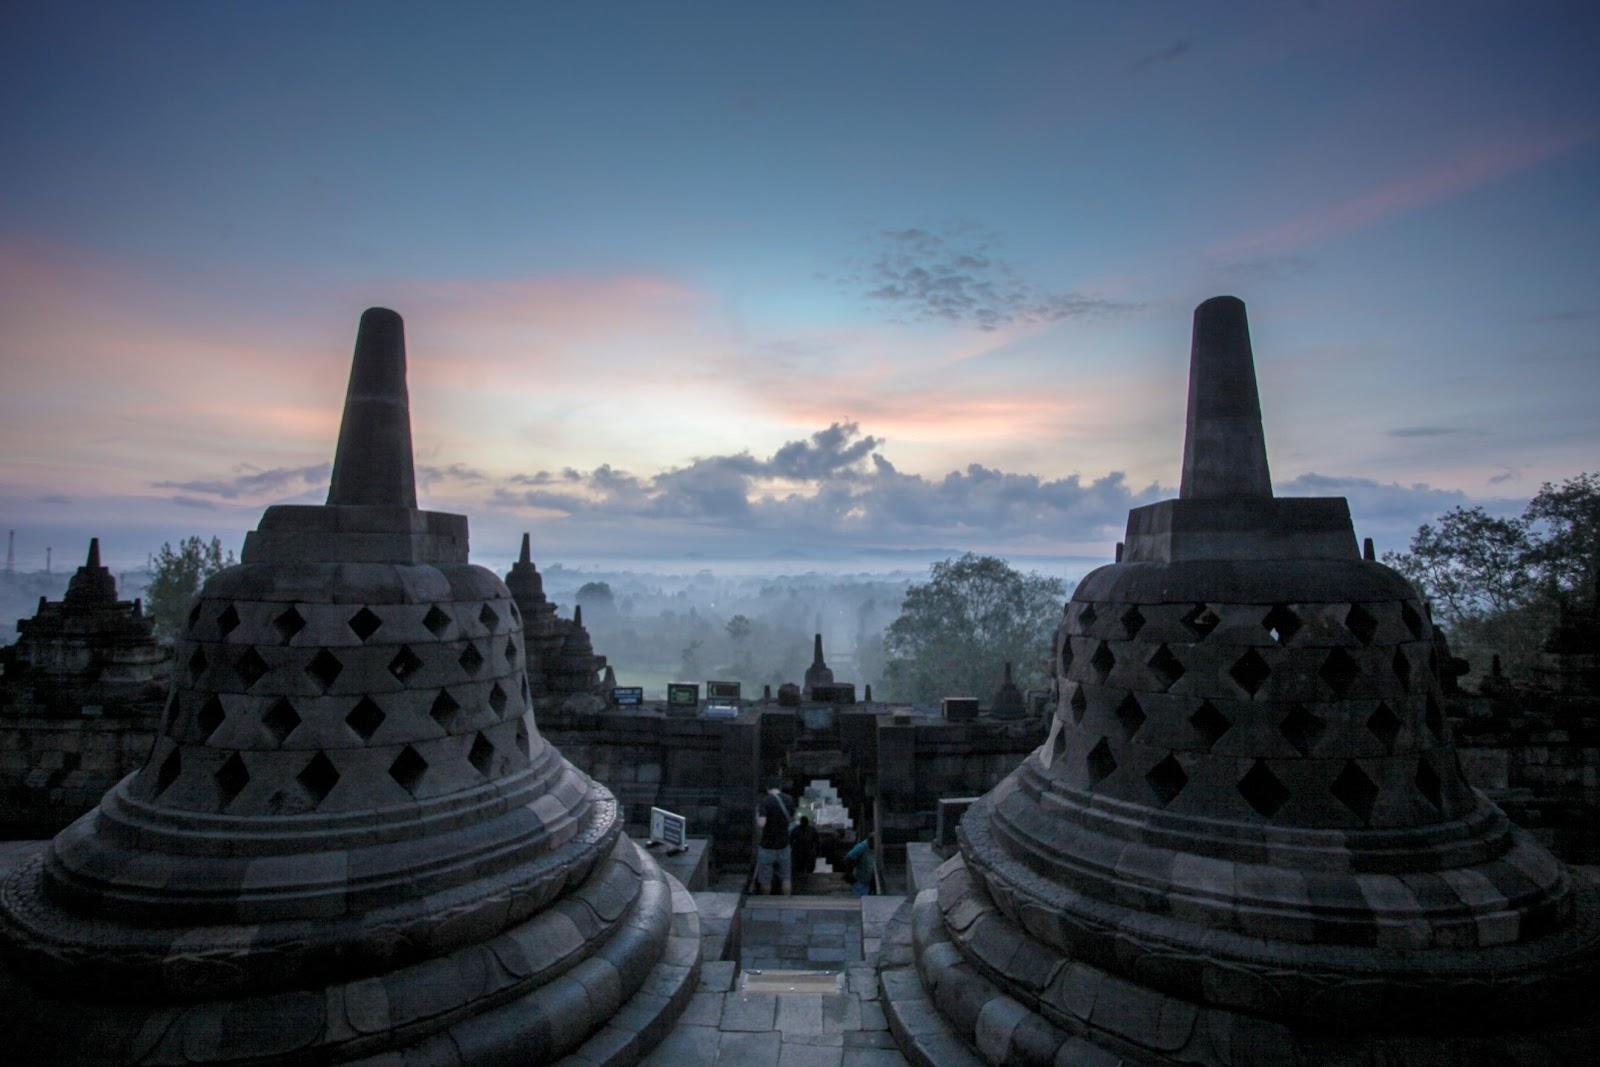 /Volumes/MAYANGWORK/KEMENPARKRAF/DIY/DIY/CANDI BOROBUDUR/APPS/VIRTUAL TOUR/ALL FOTO/Borobudur-000007.jpg